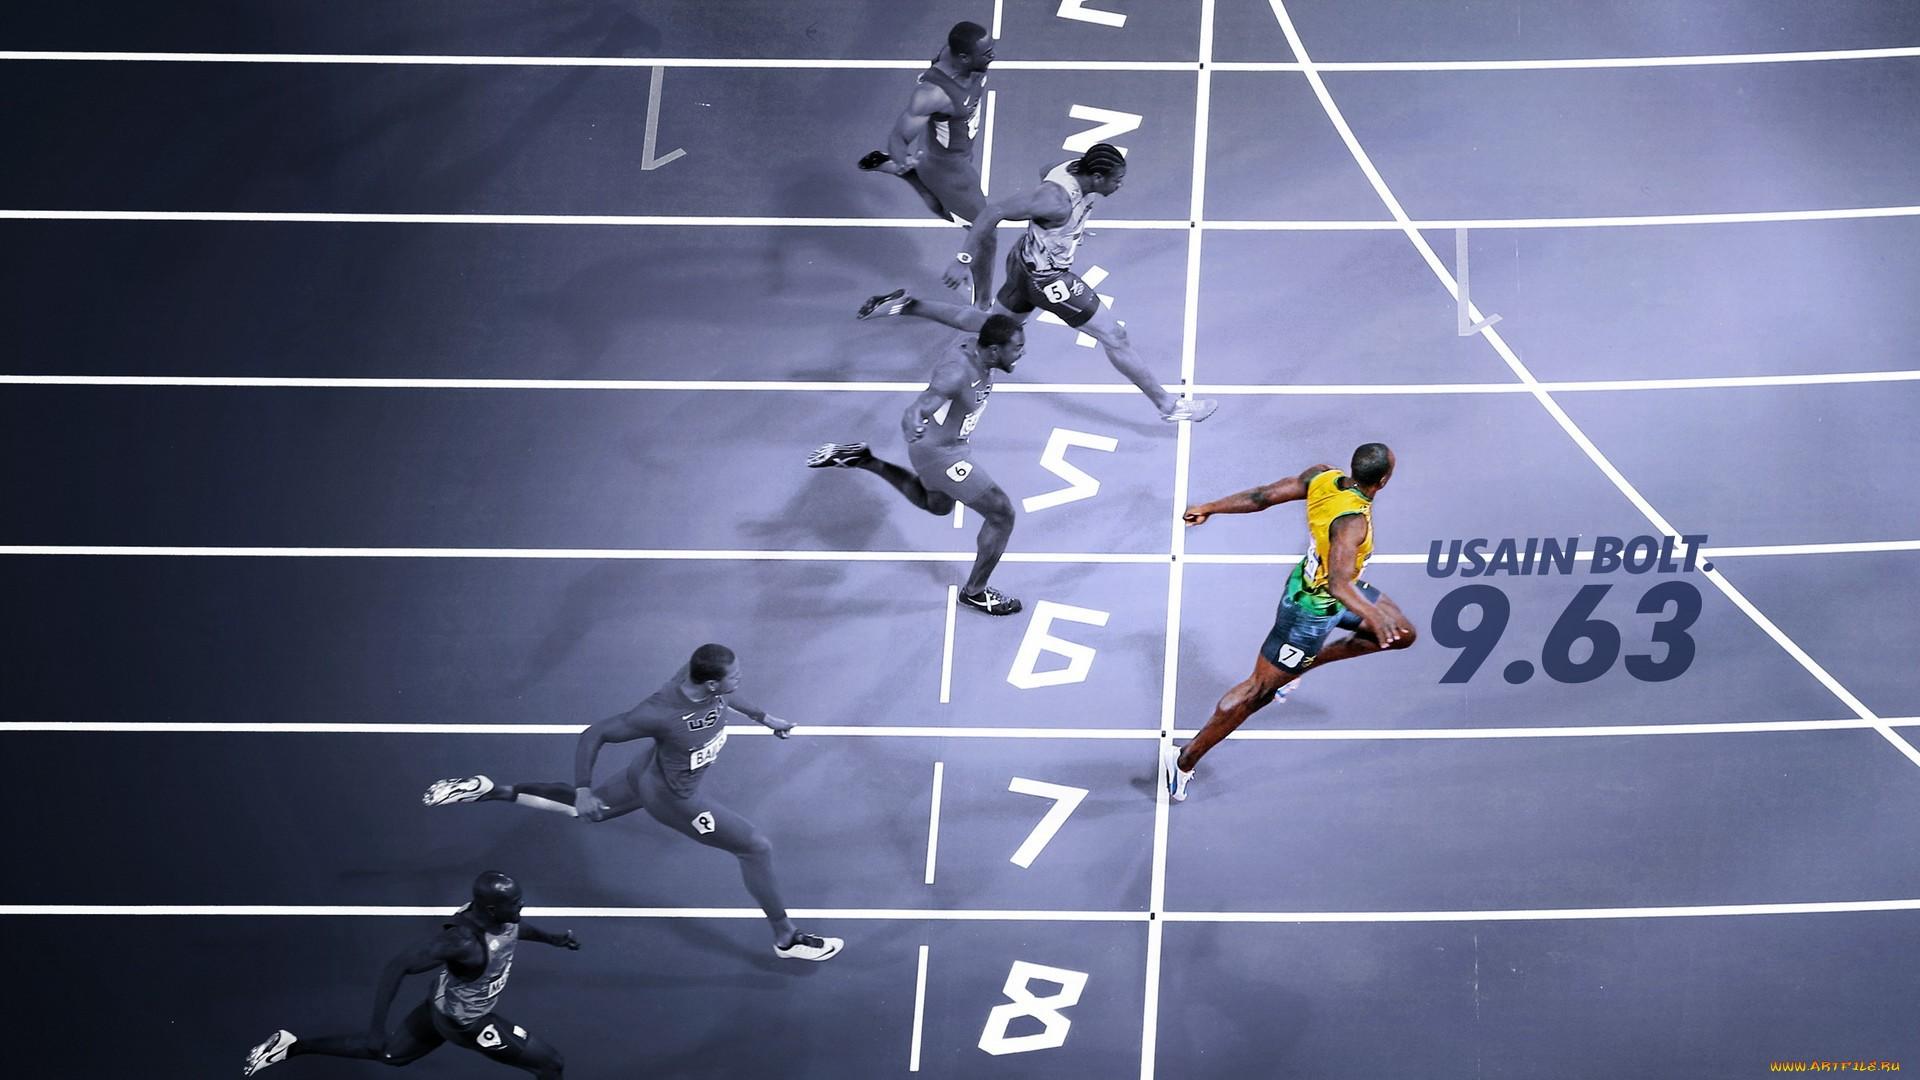 Usain Bolt Screenshots